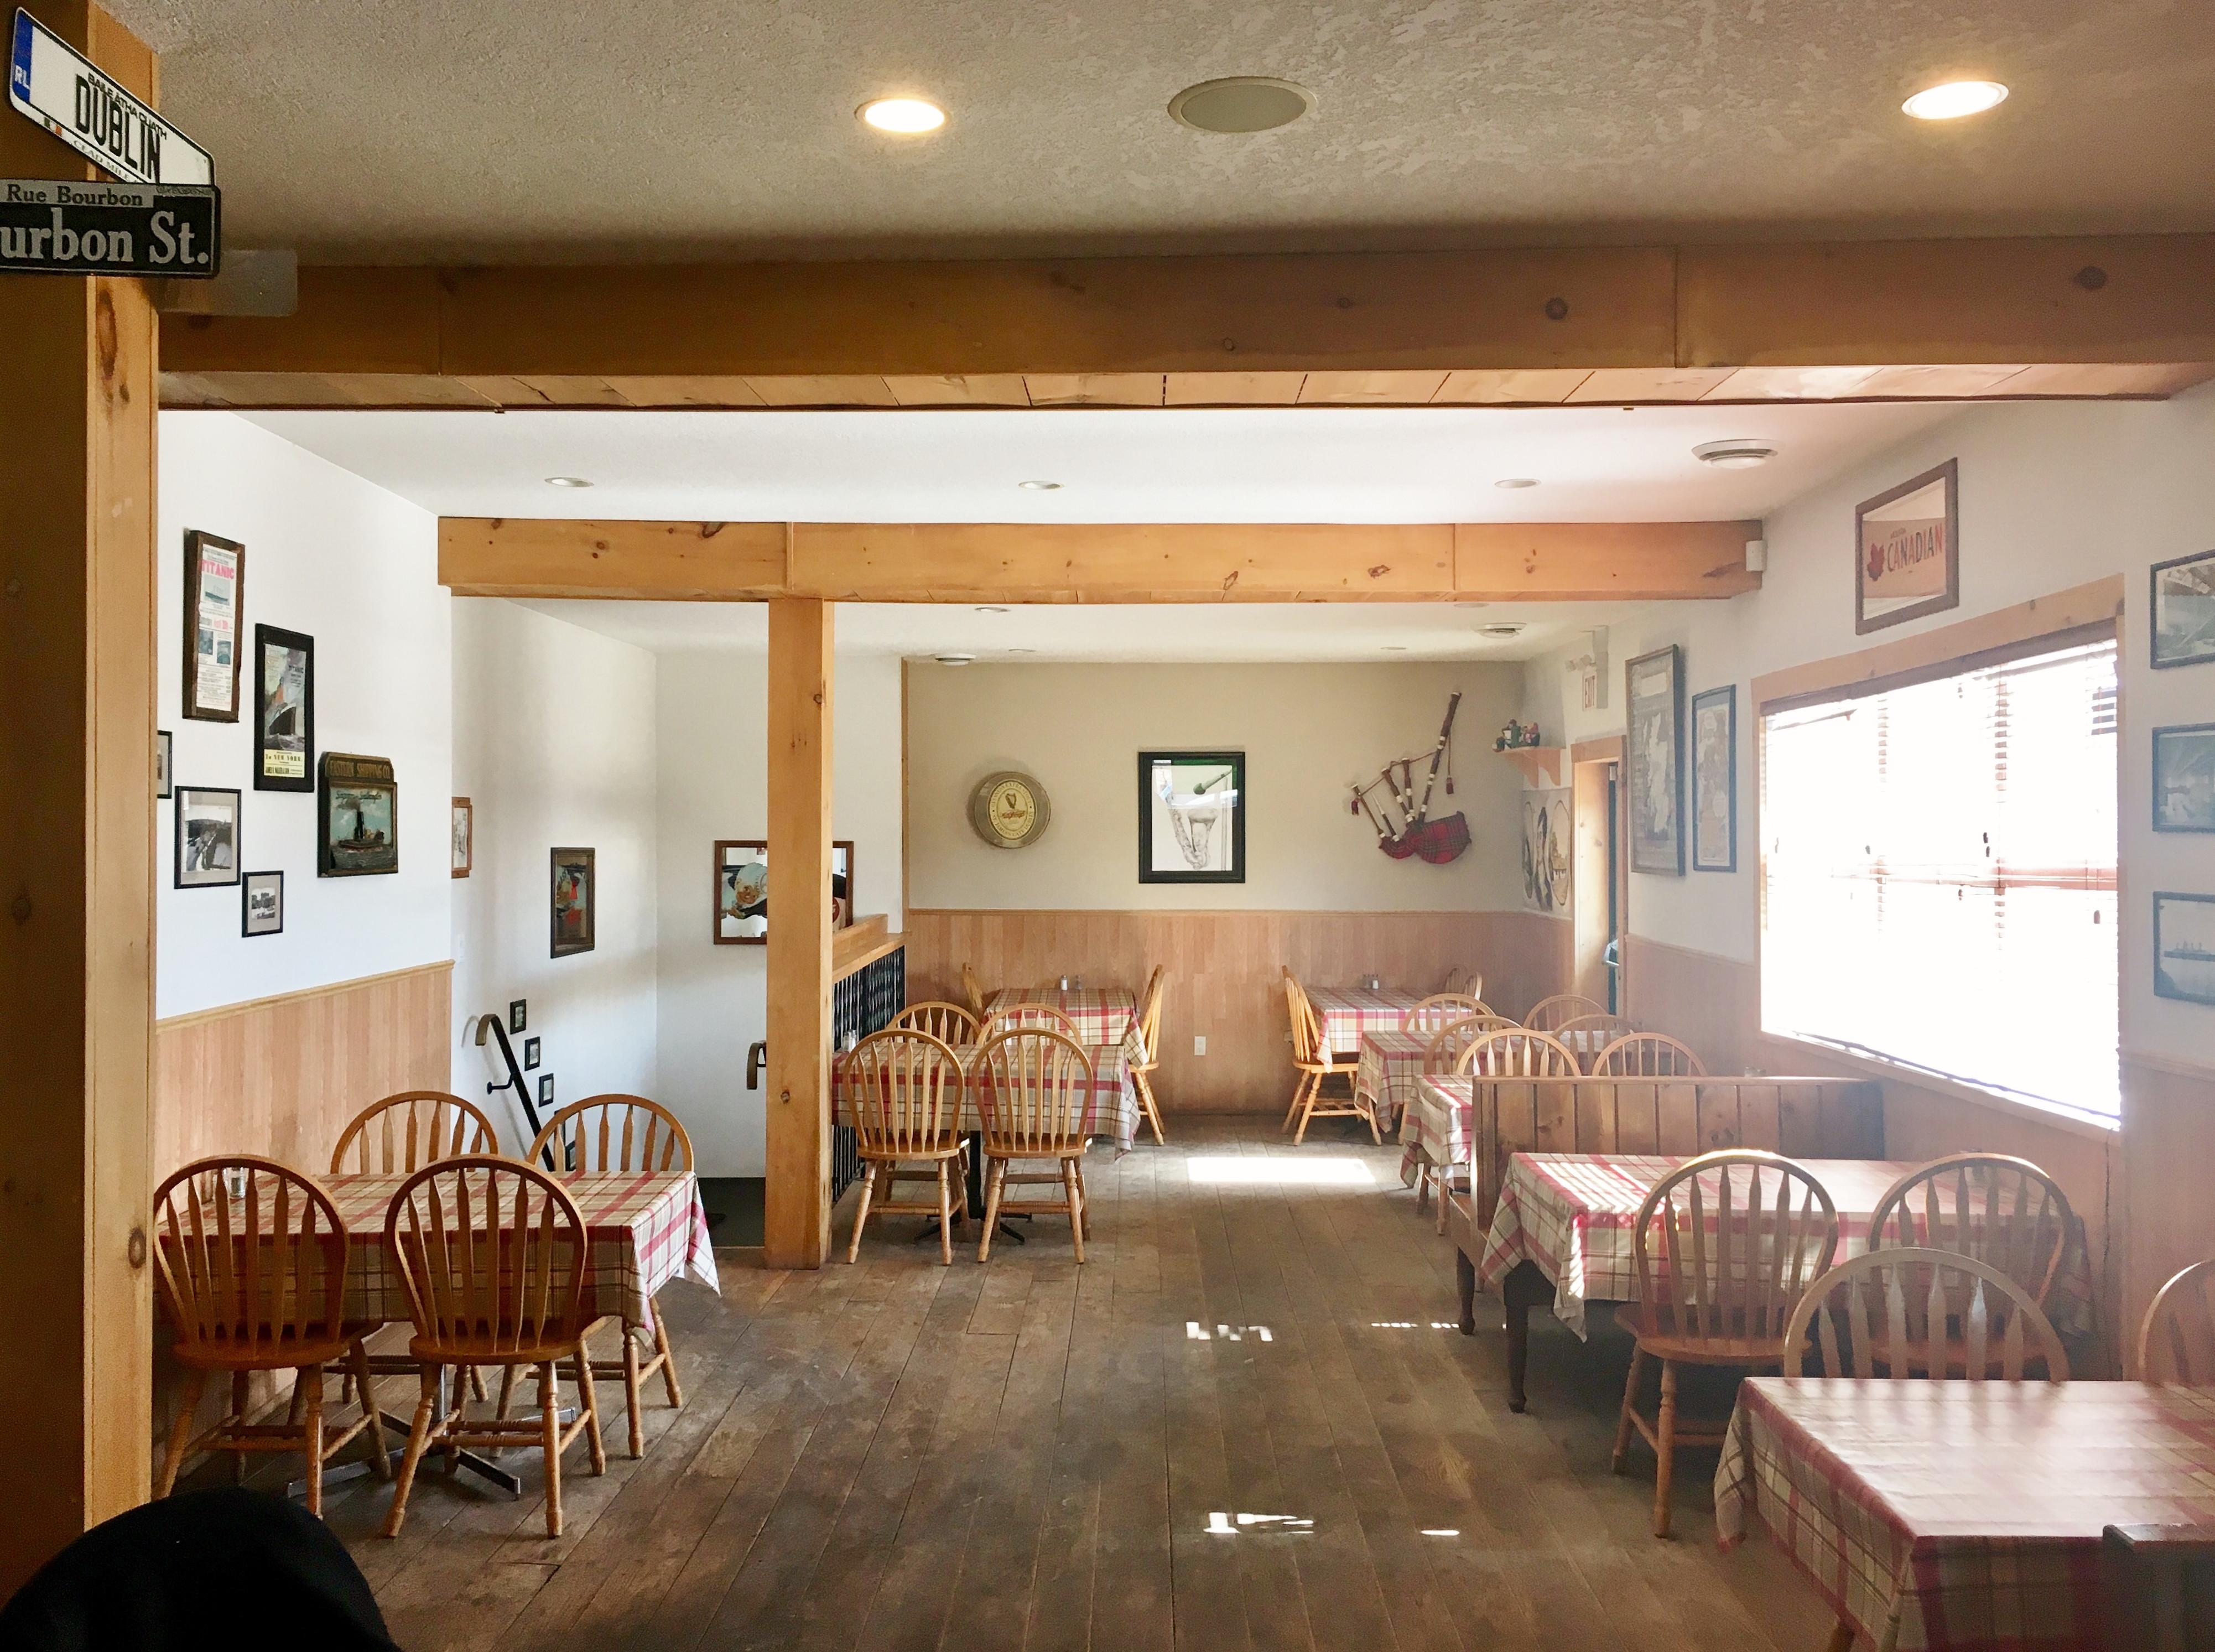 hardwood flooring sale kitchener waterloo of 337 2nd street hanover for sale commercial real estate and land for 337 2nd street hanover for sale